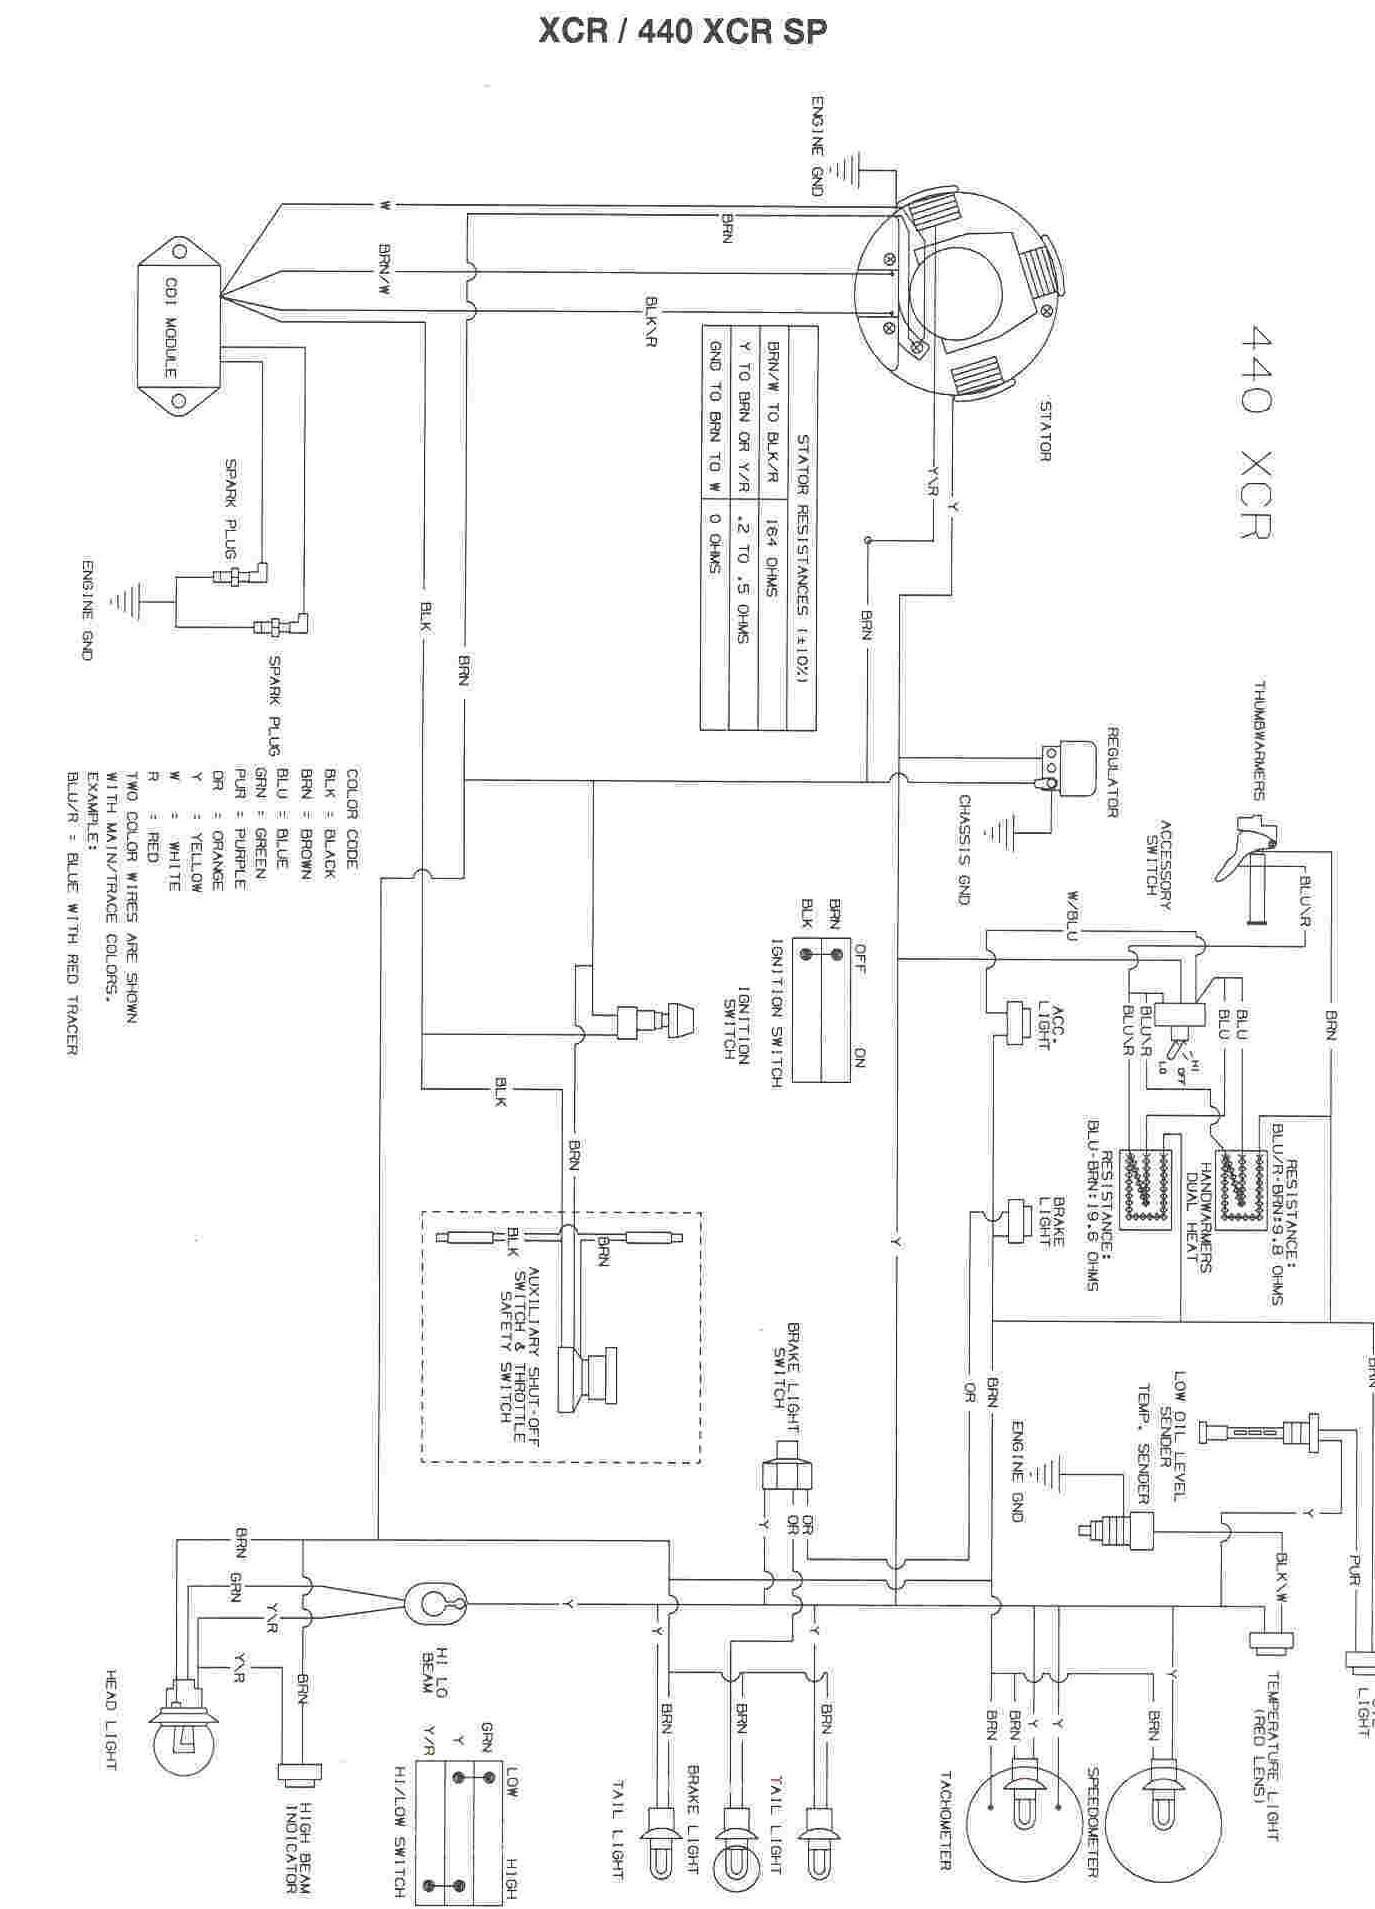 Polaris Ranger Light Switch Wiring Diagram New Fresh Harley Davidson Ignition Switch Wiring Diagram Diagram